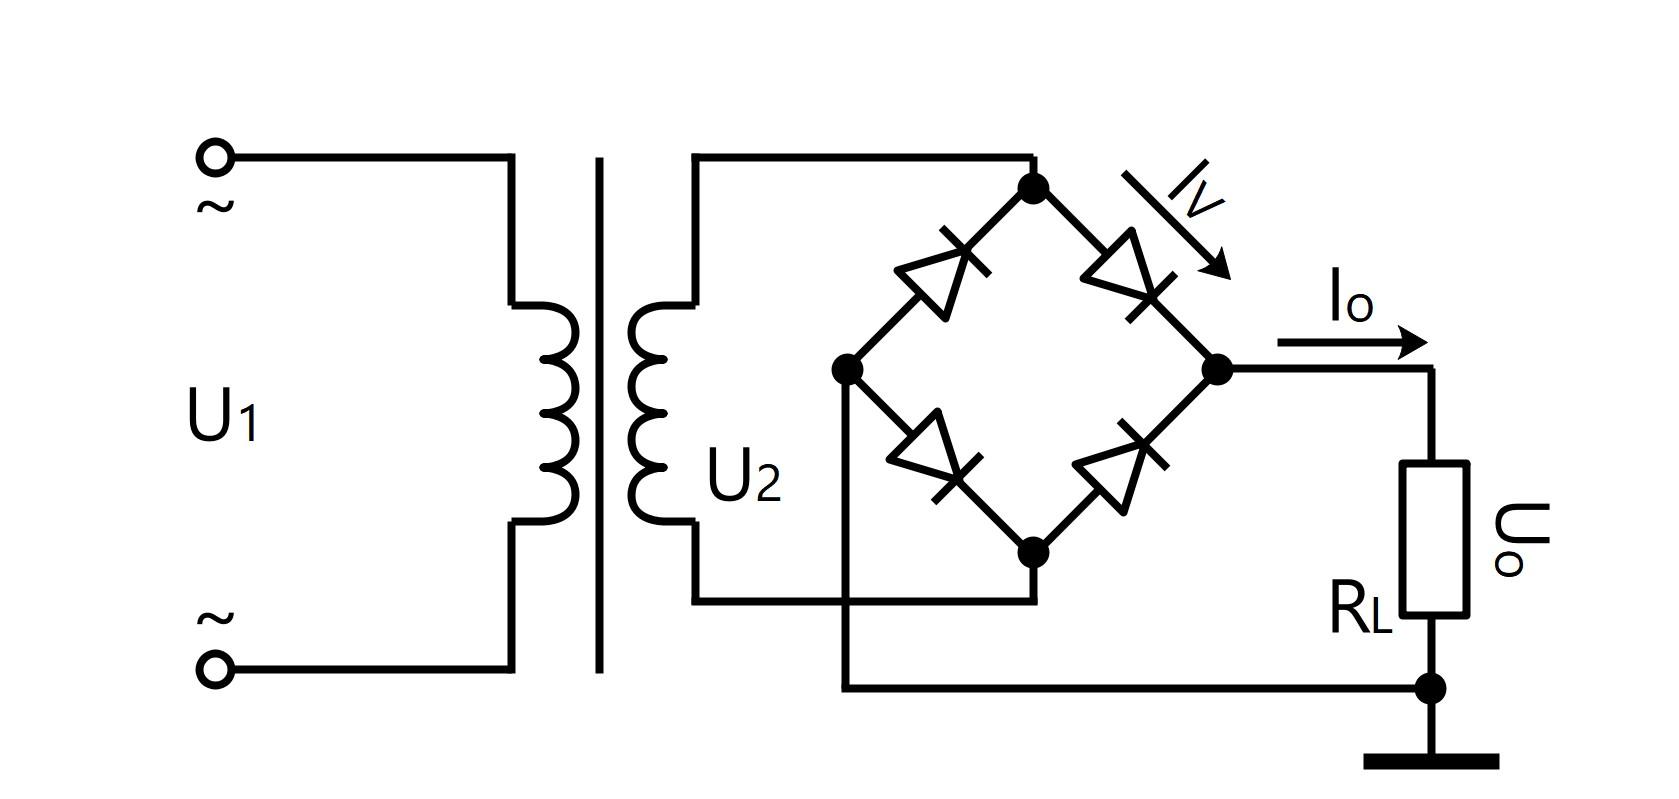 Single-Phase Full-Wave Rectification Circuit. More details via sales@huimultd.com